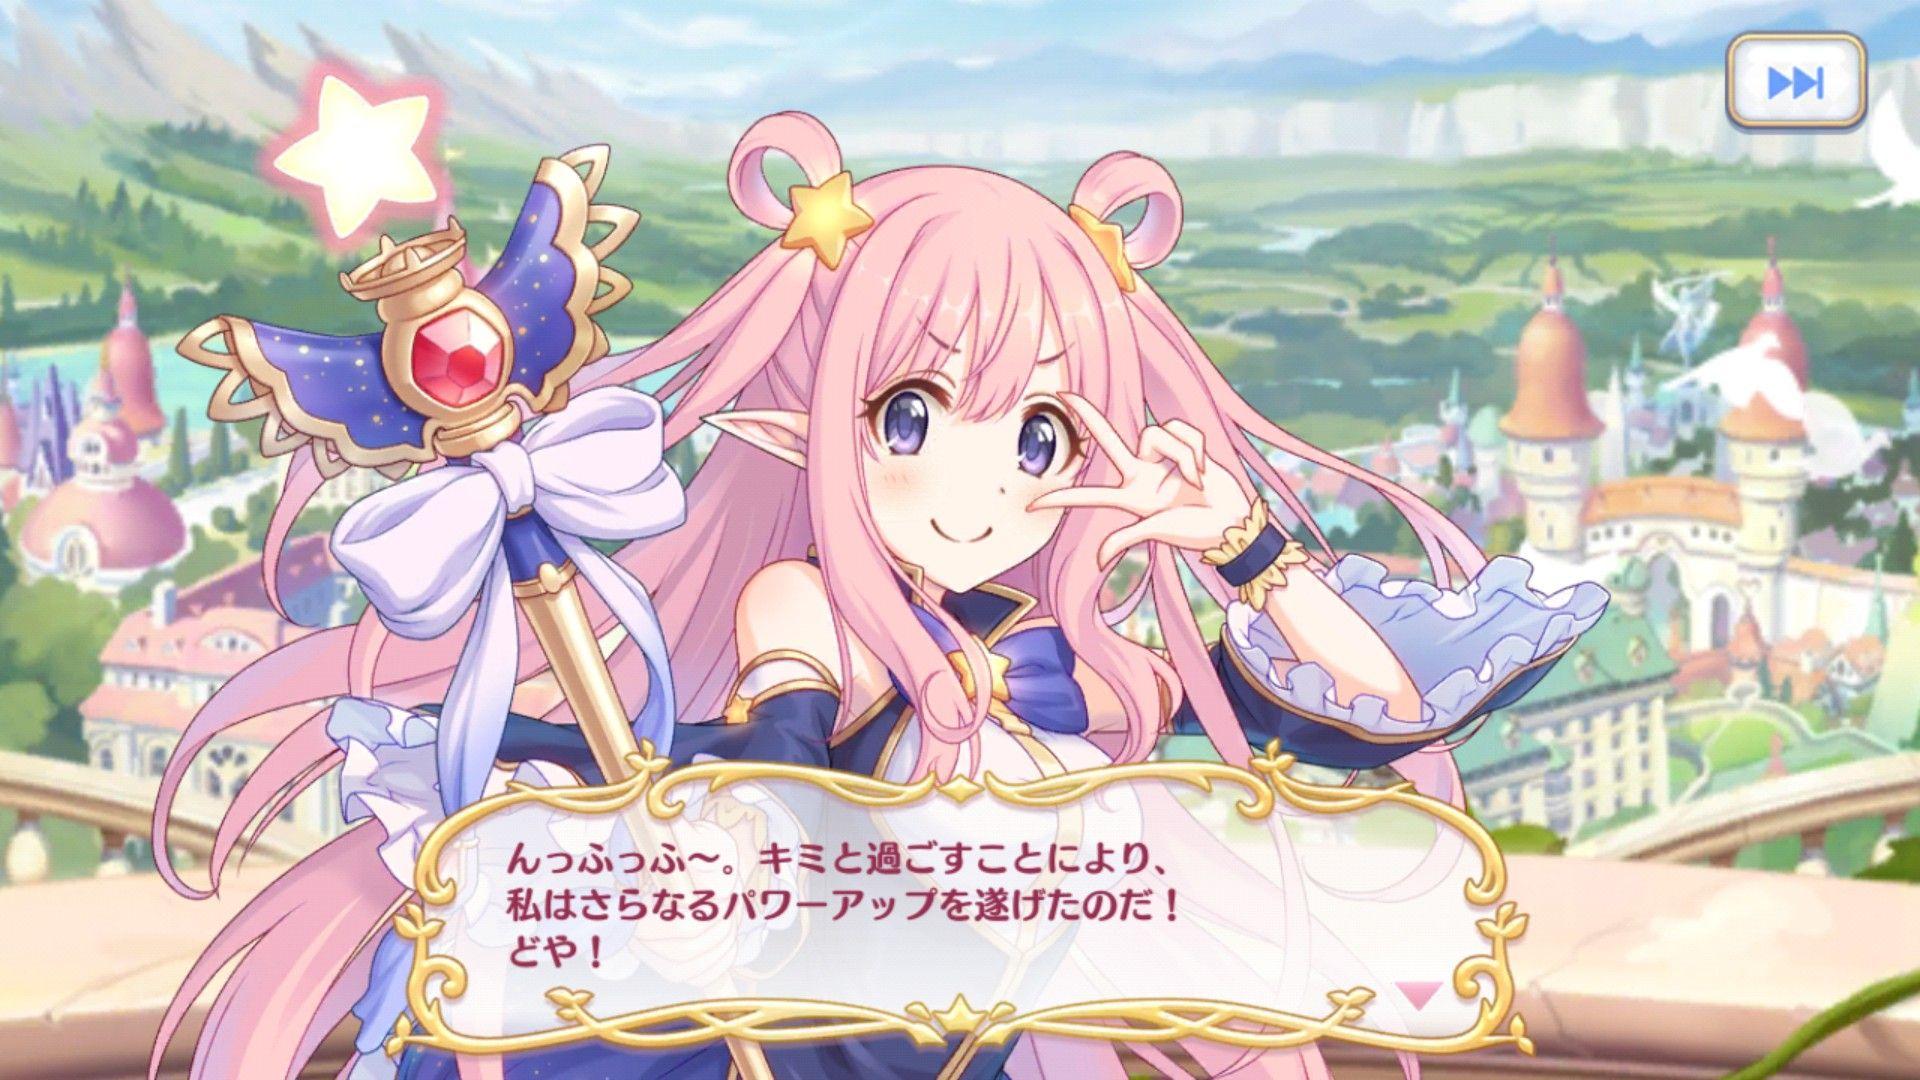 Pin by Kuroko Tetsuya on Princess Connect! Character